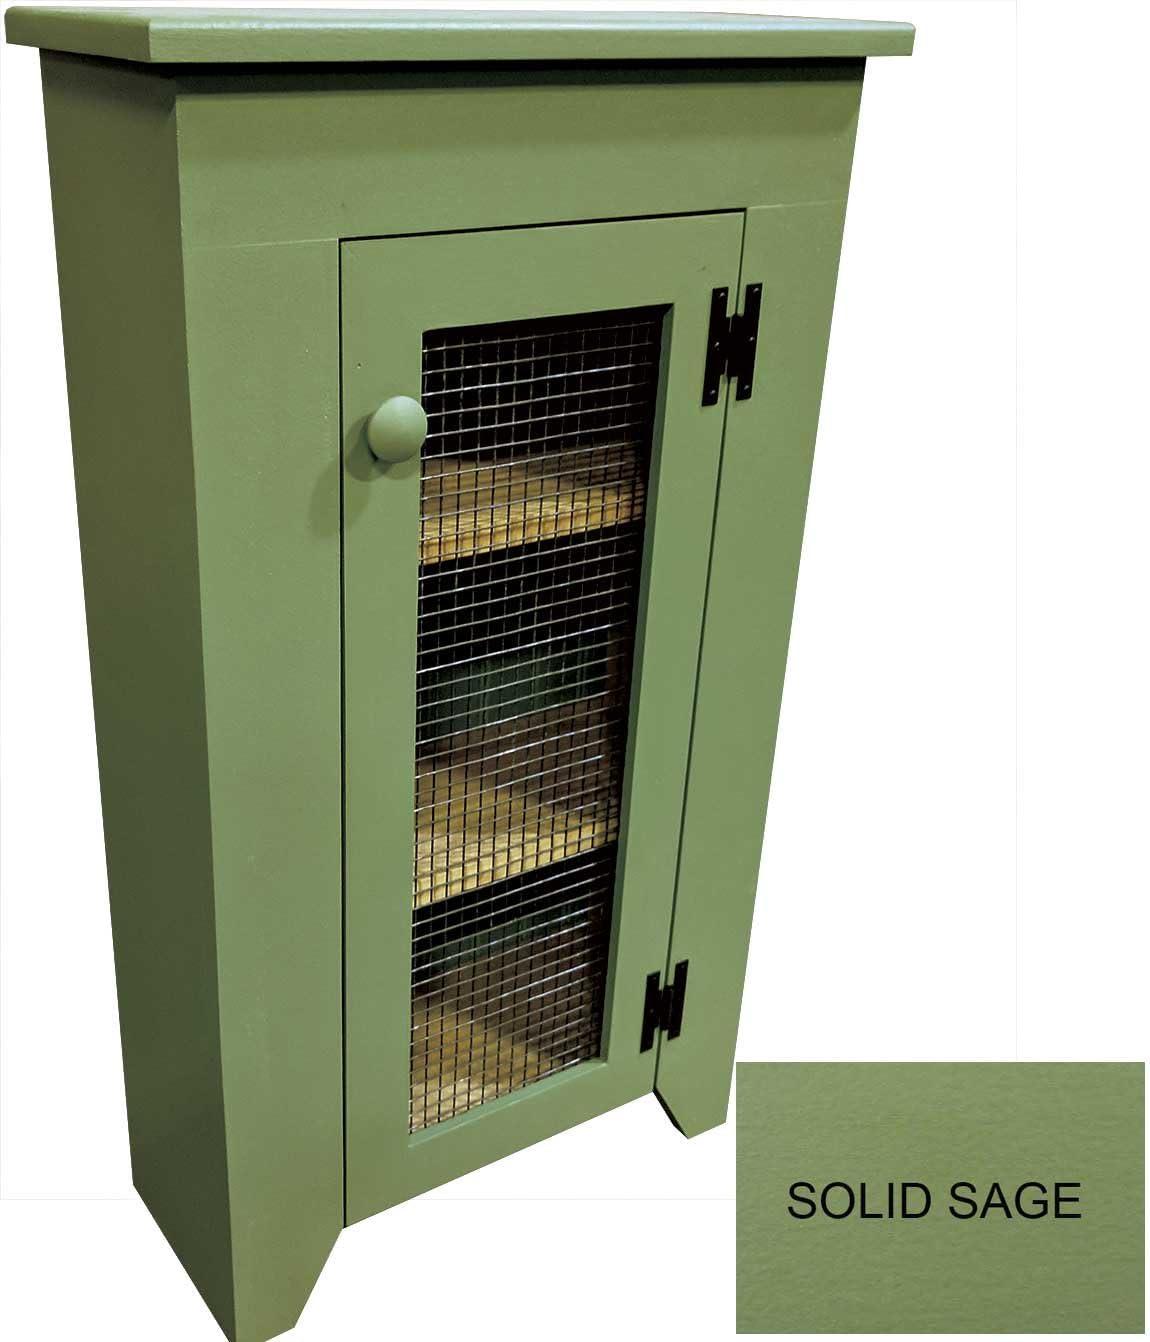 Narrow Cabinet Ranking TOP13 with Be super welcome Screen Solid Sage Door